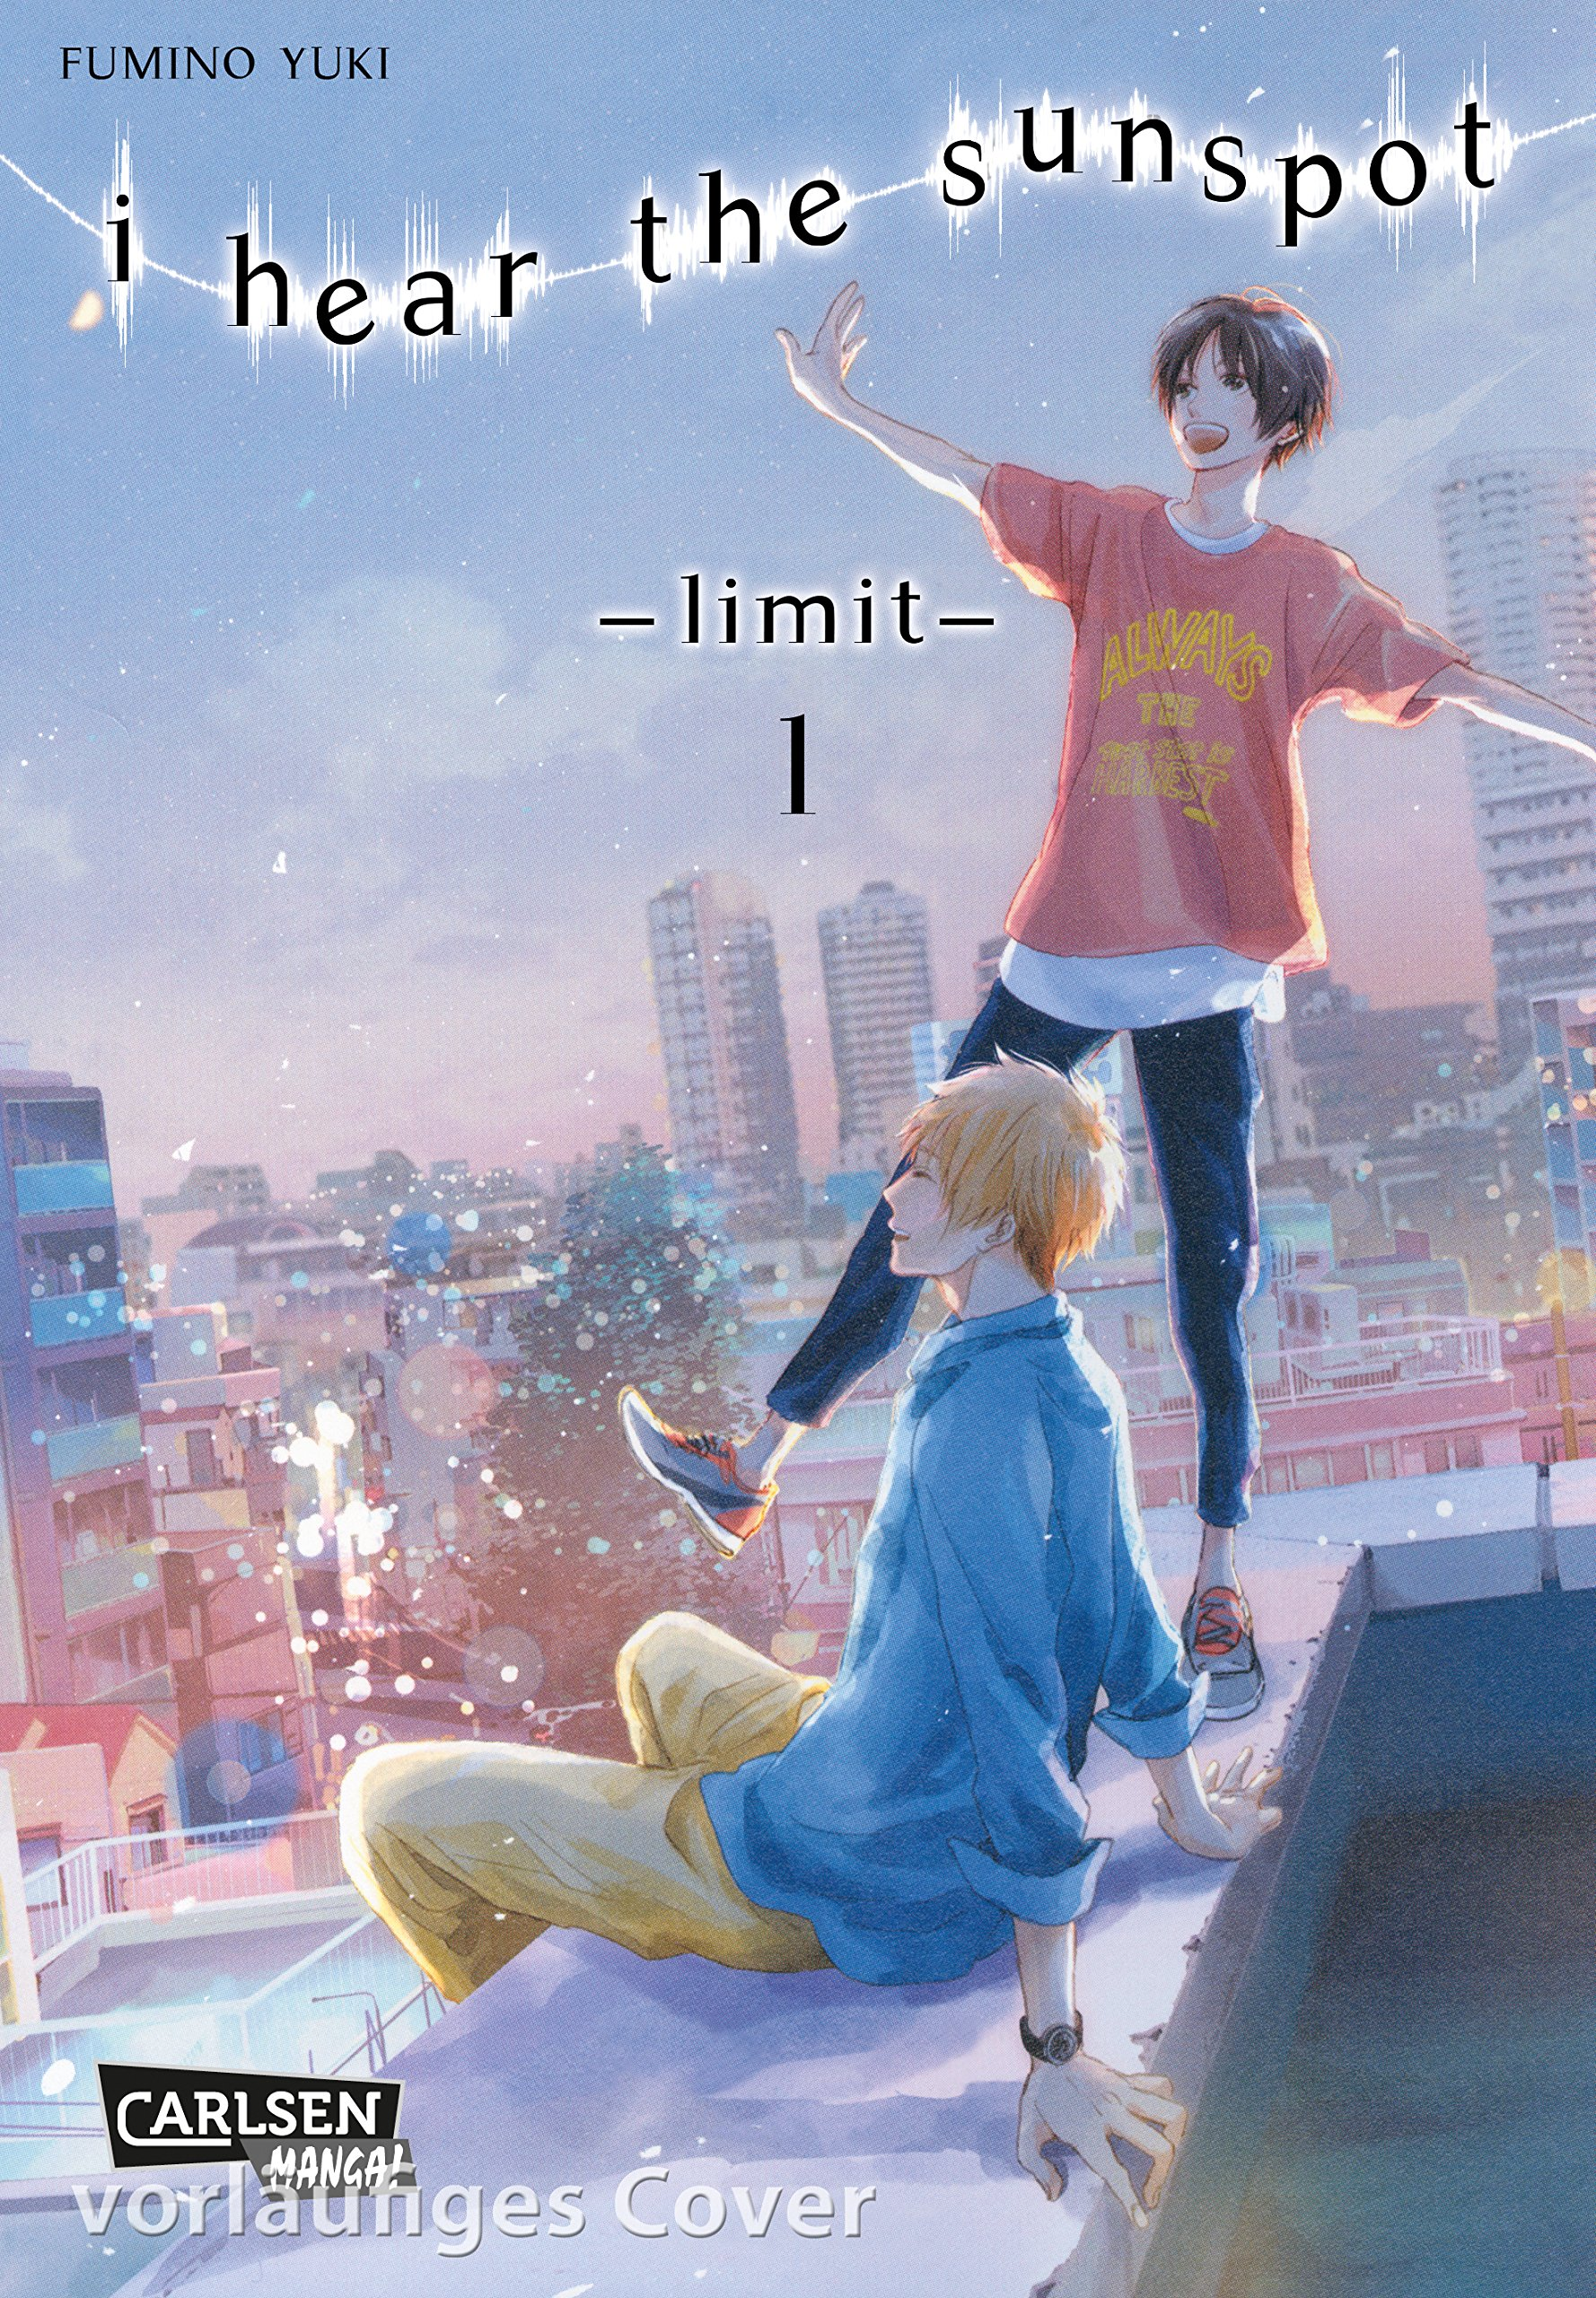 I Hear The Sunspot - Limit 1 Taschenbuch – 26. Februar 2019 Yuki Fumino Carlsen 3551714894 Bezug zu Schwulen und Lesben